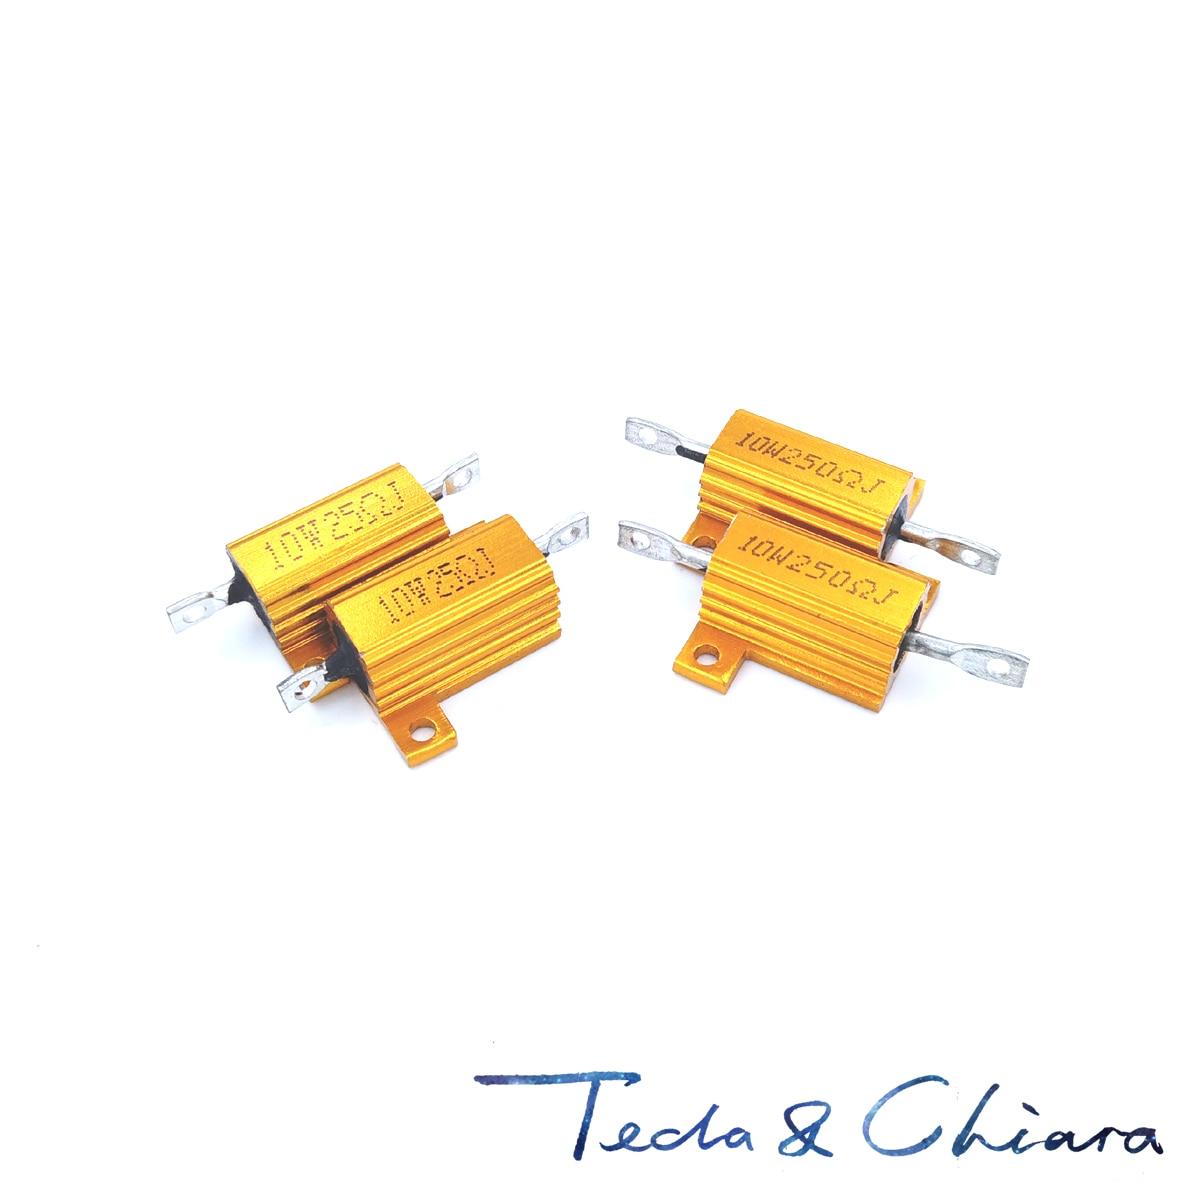 330R 330 330ohm 390R 390 390ohm R Ohm 10W Watt Gold Tone Wirewound Aluminum Power Metal Shell Case Resistance Resistor RX24